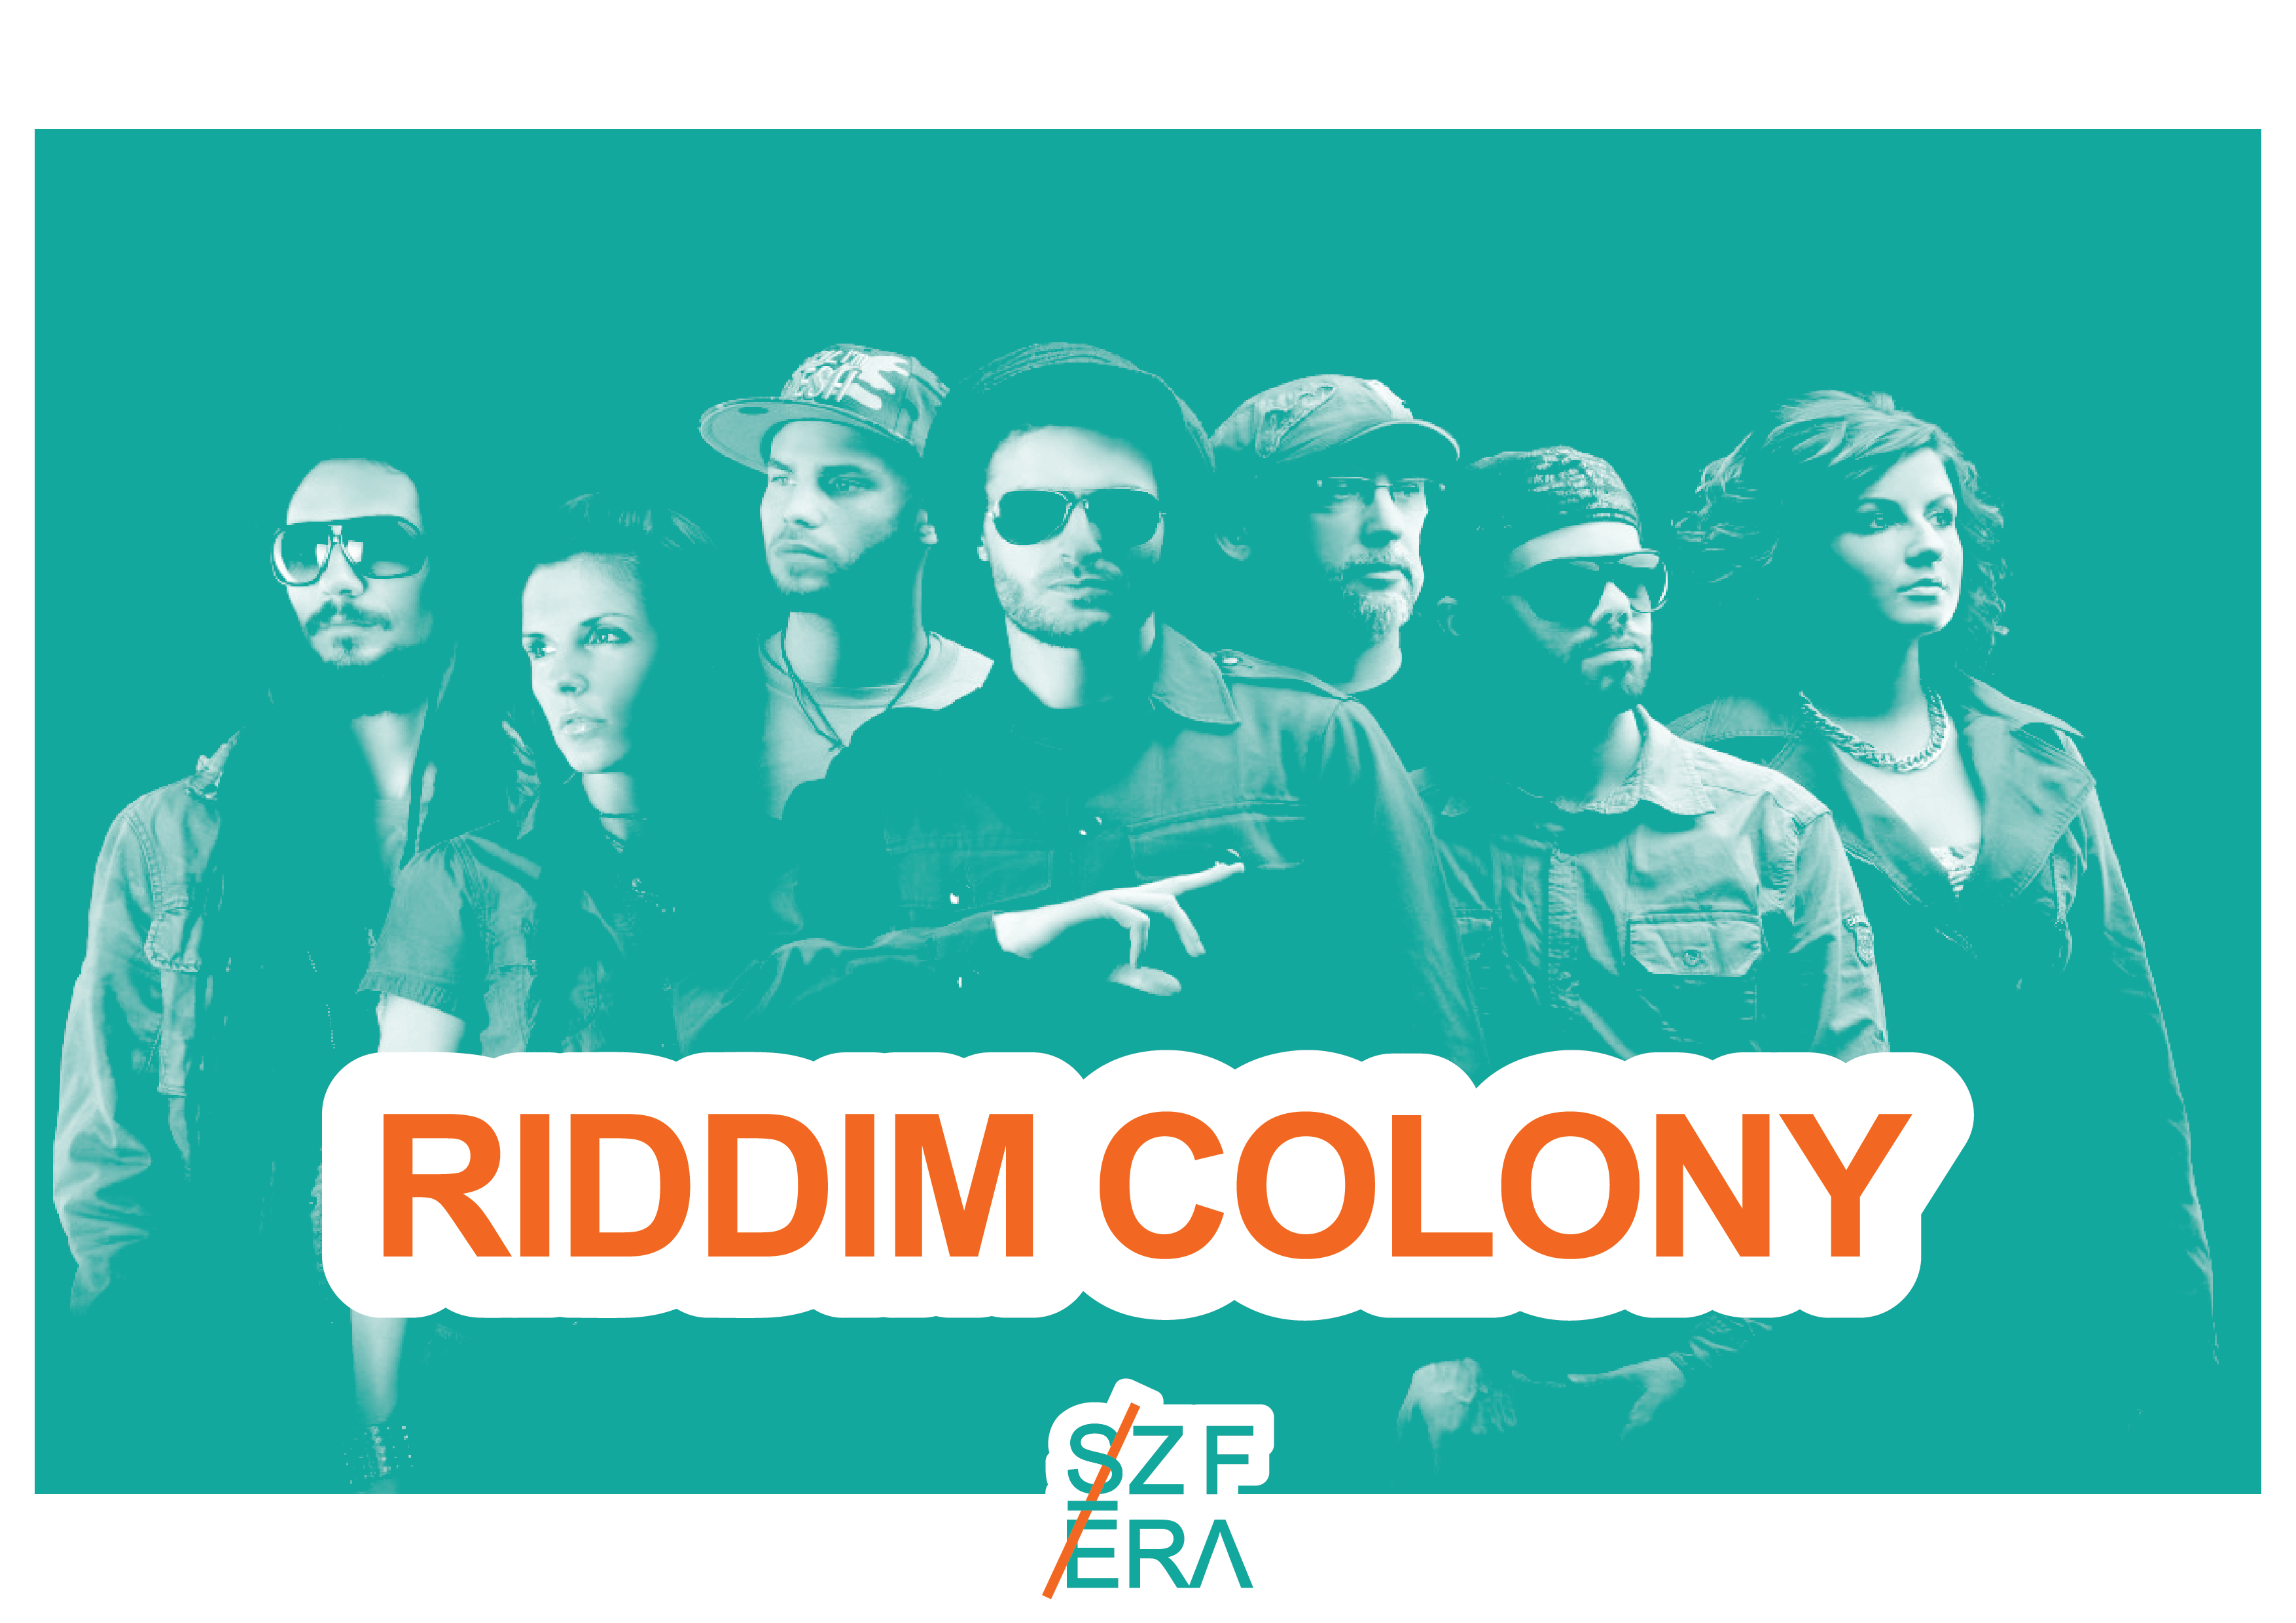 riddim.colony